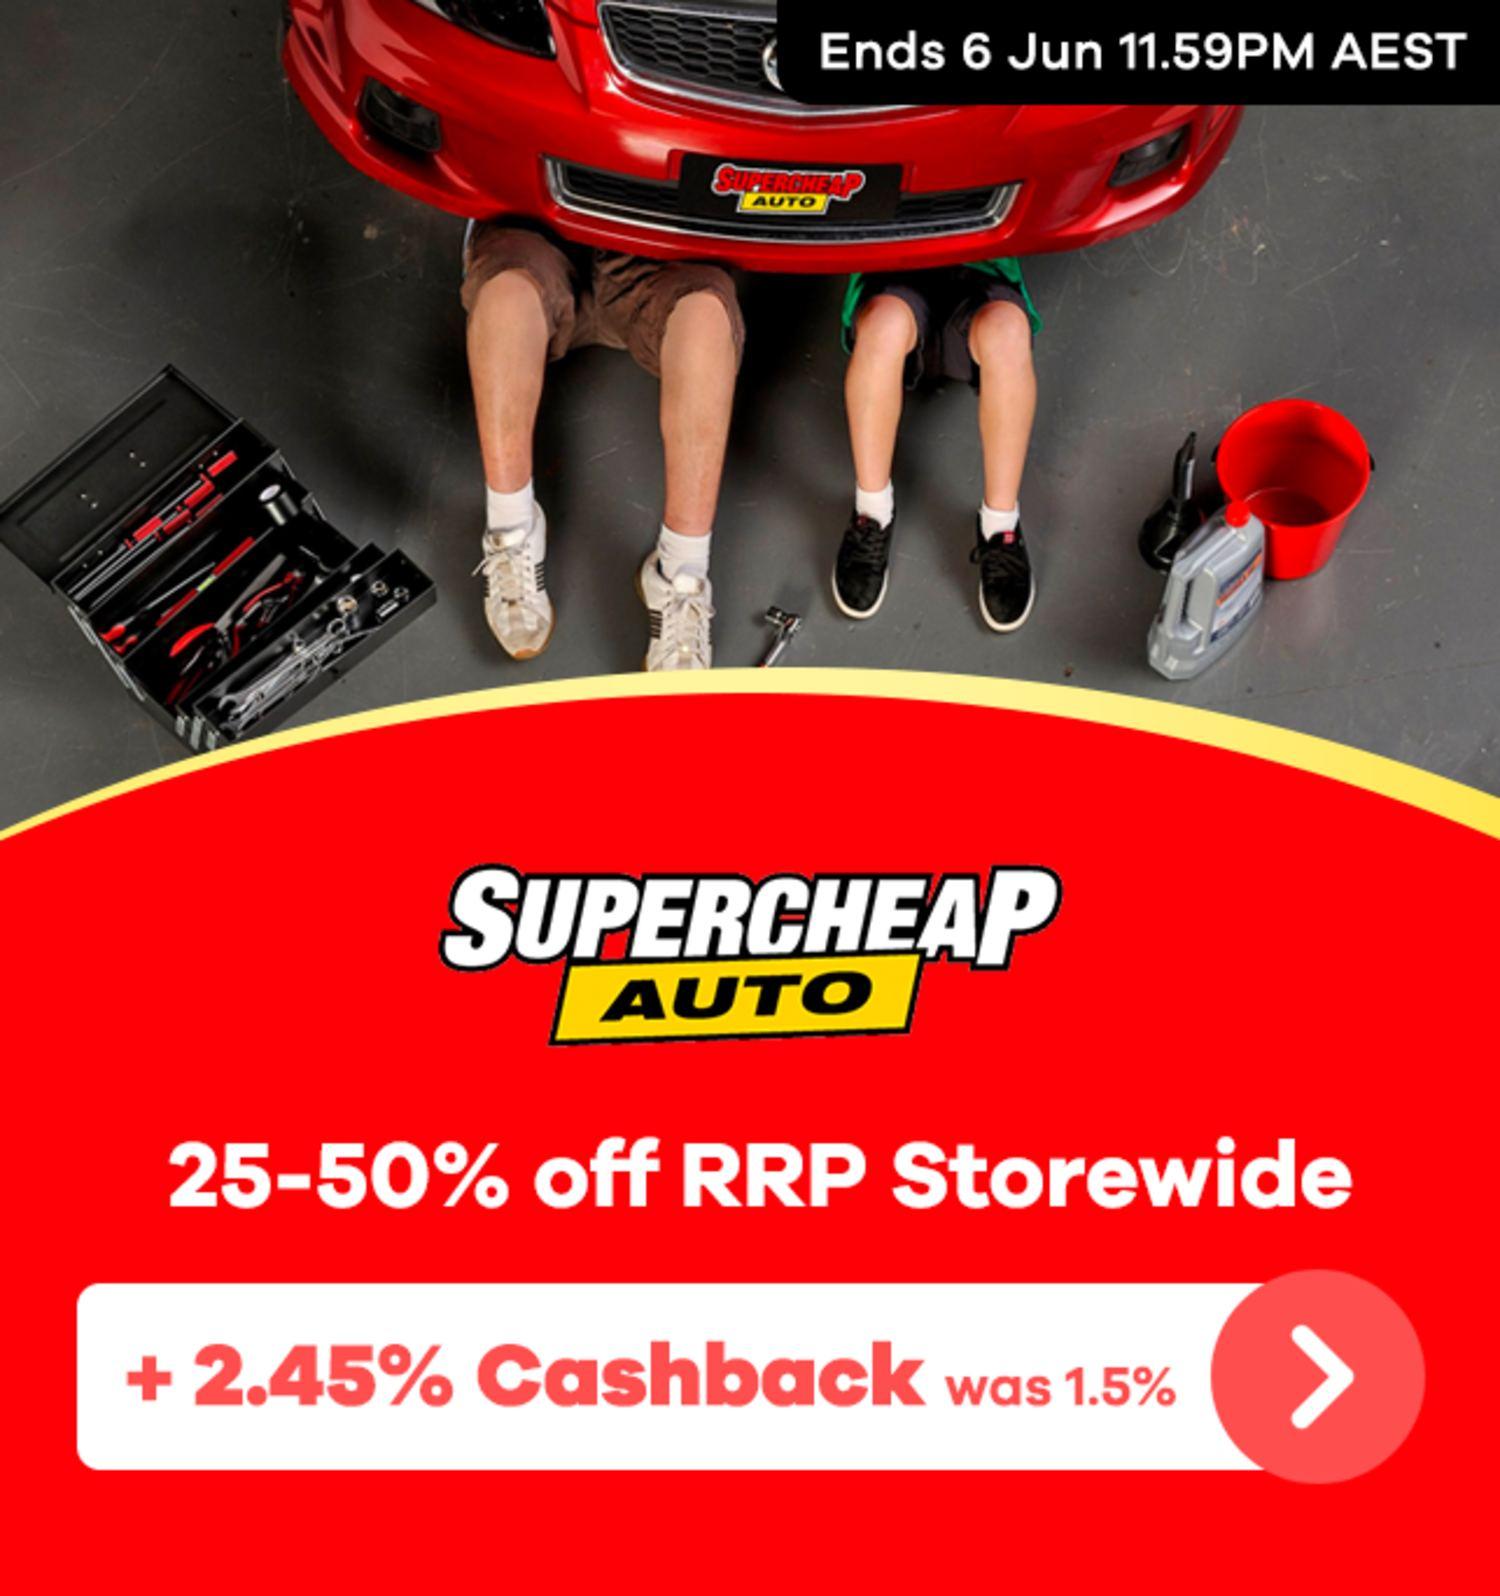 Supercheap Auto - 2.45% Upsized Cashback (June 2020)